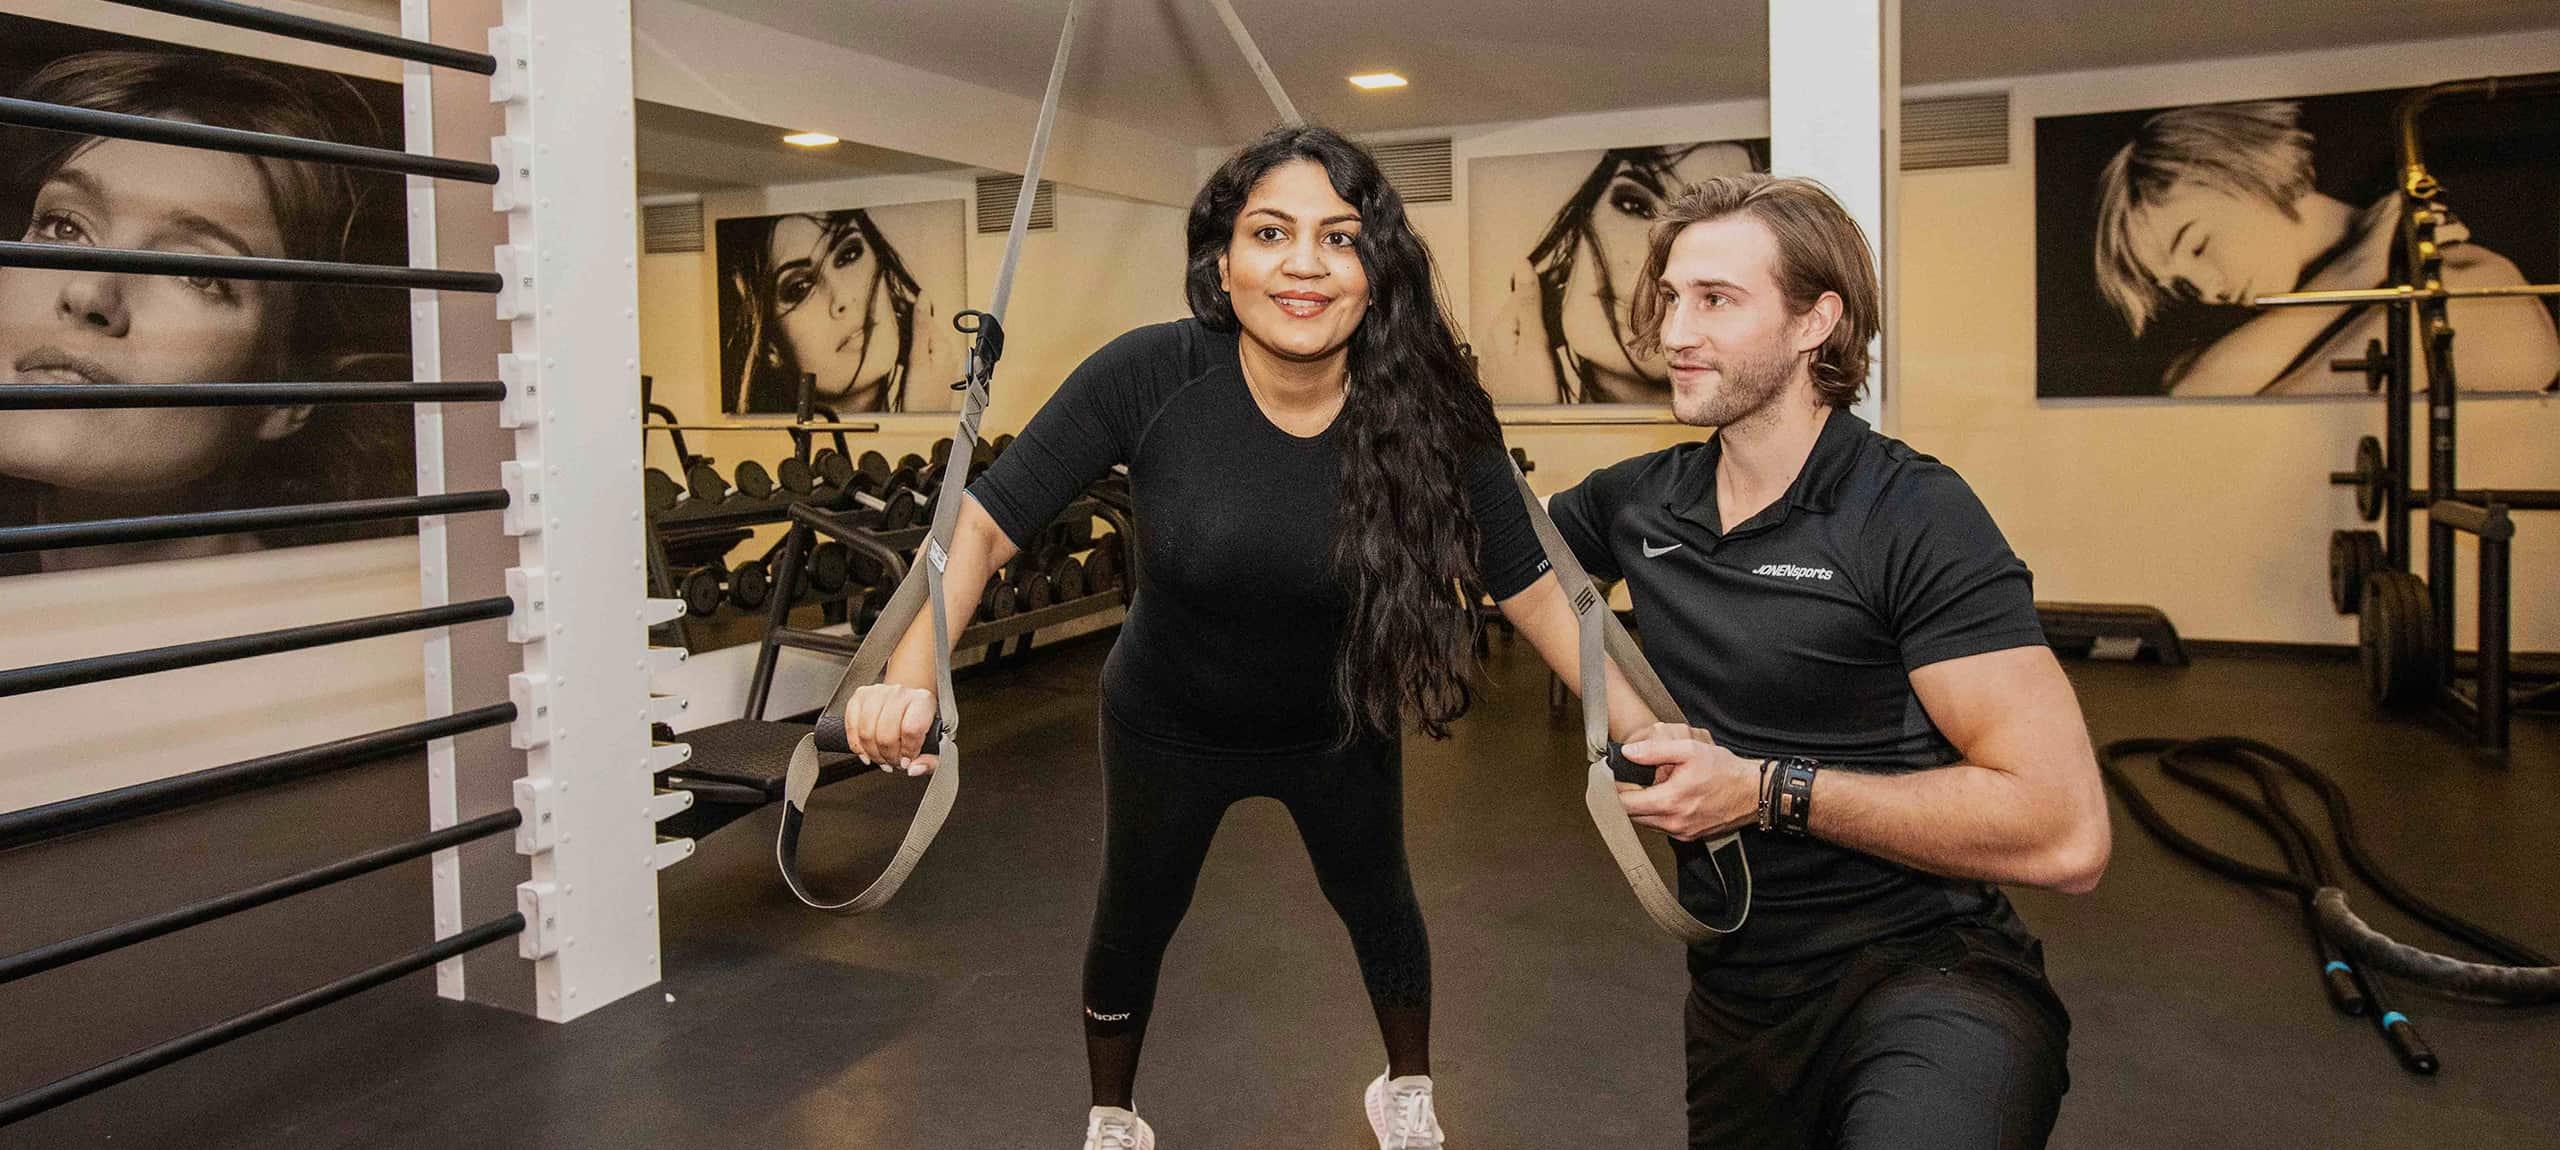 personal training bei jonensports